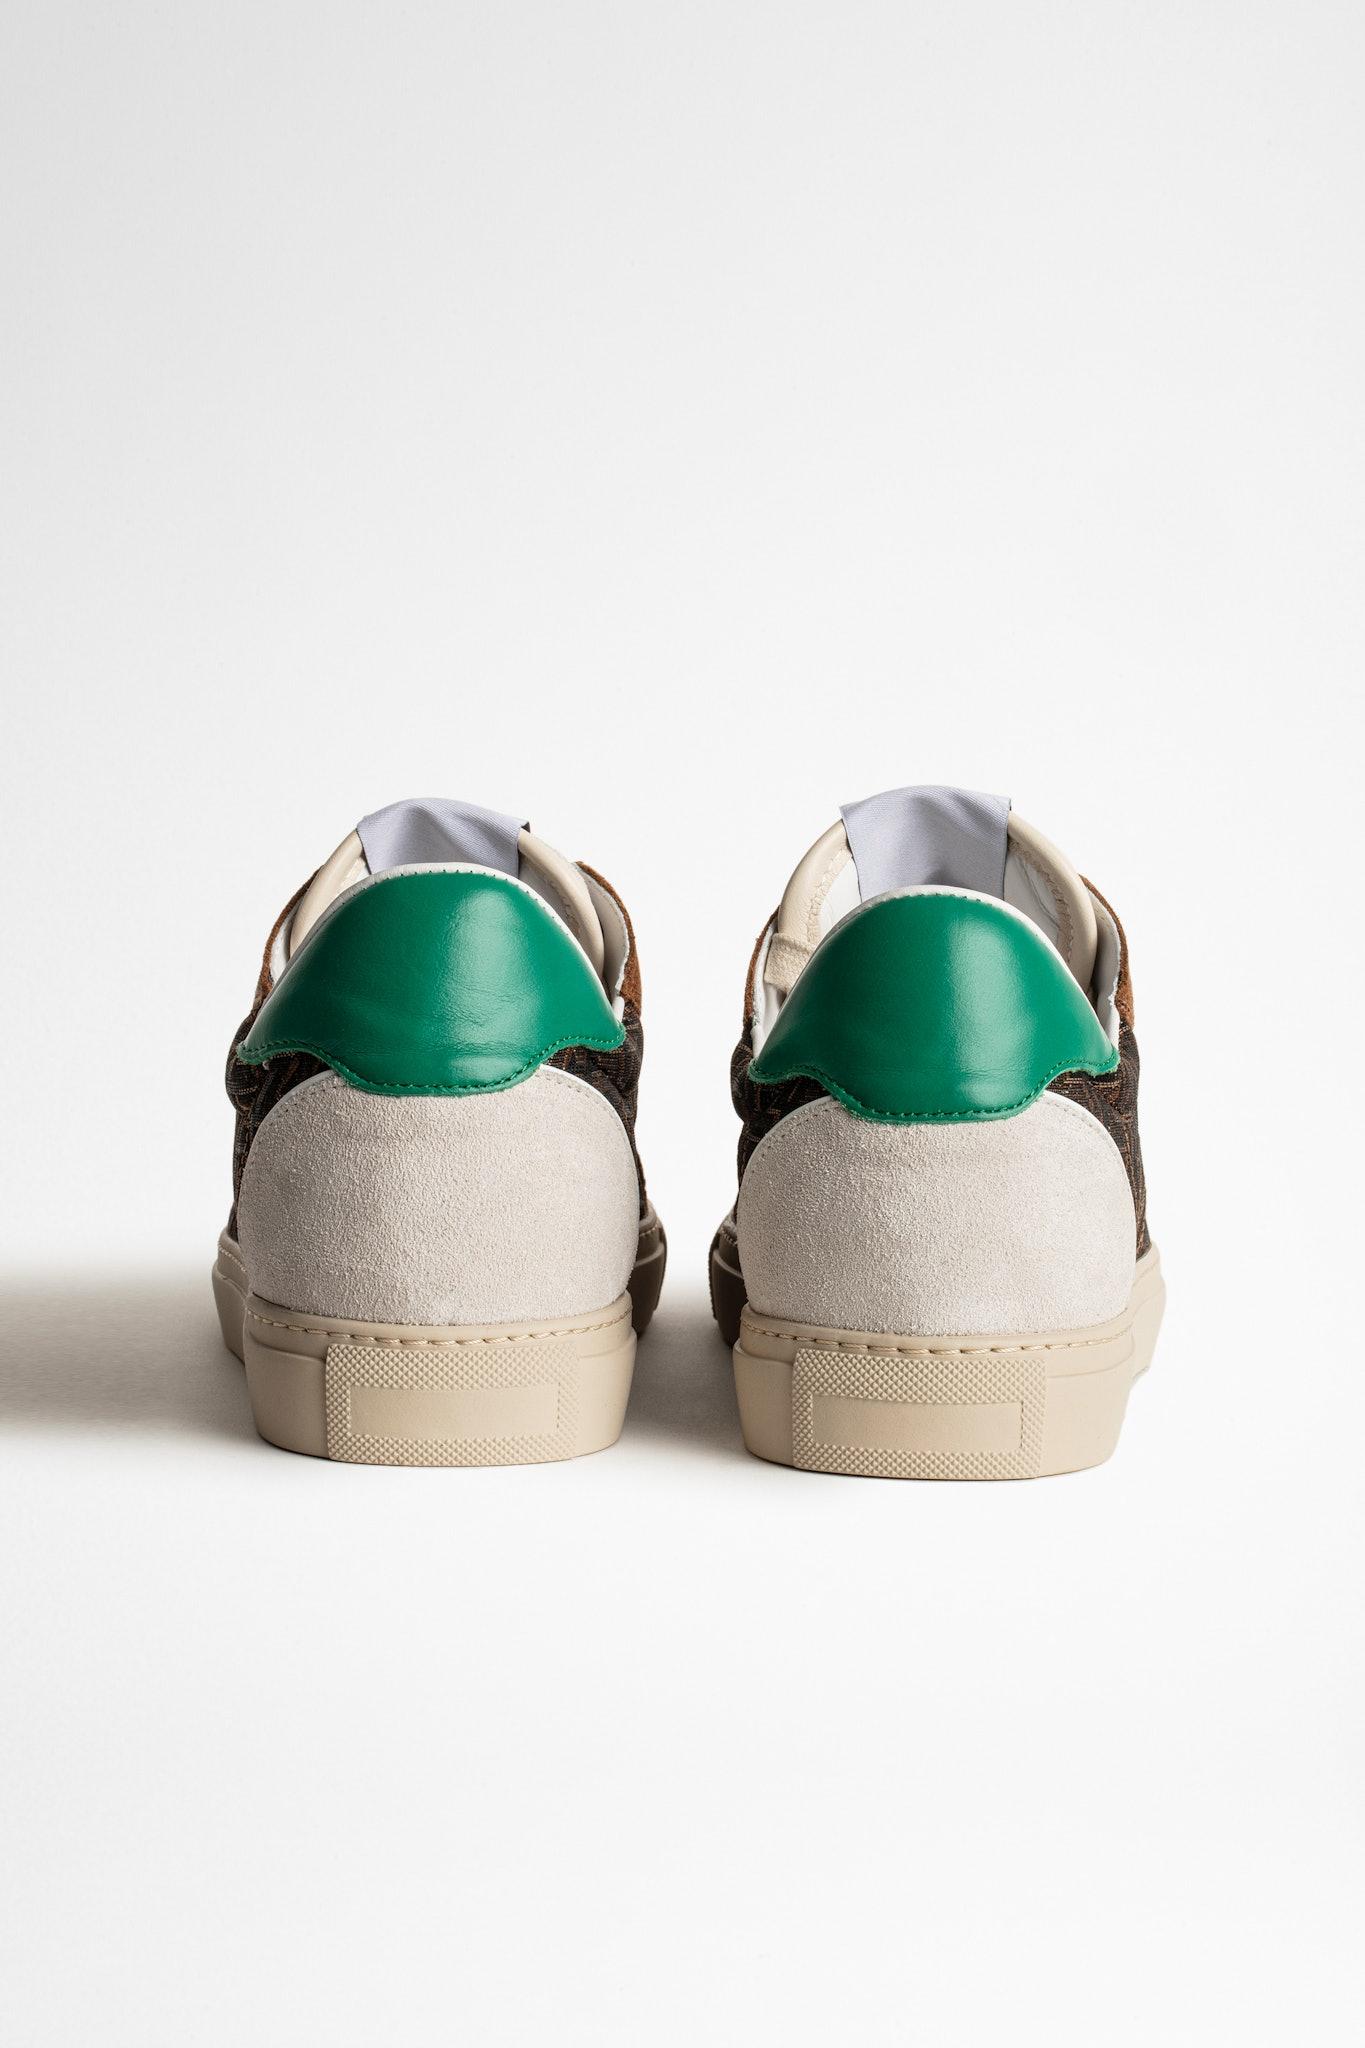 ZV1747 Board Sneakers - Monogram